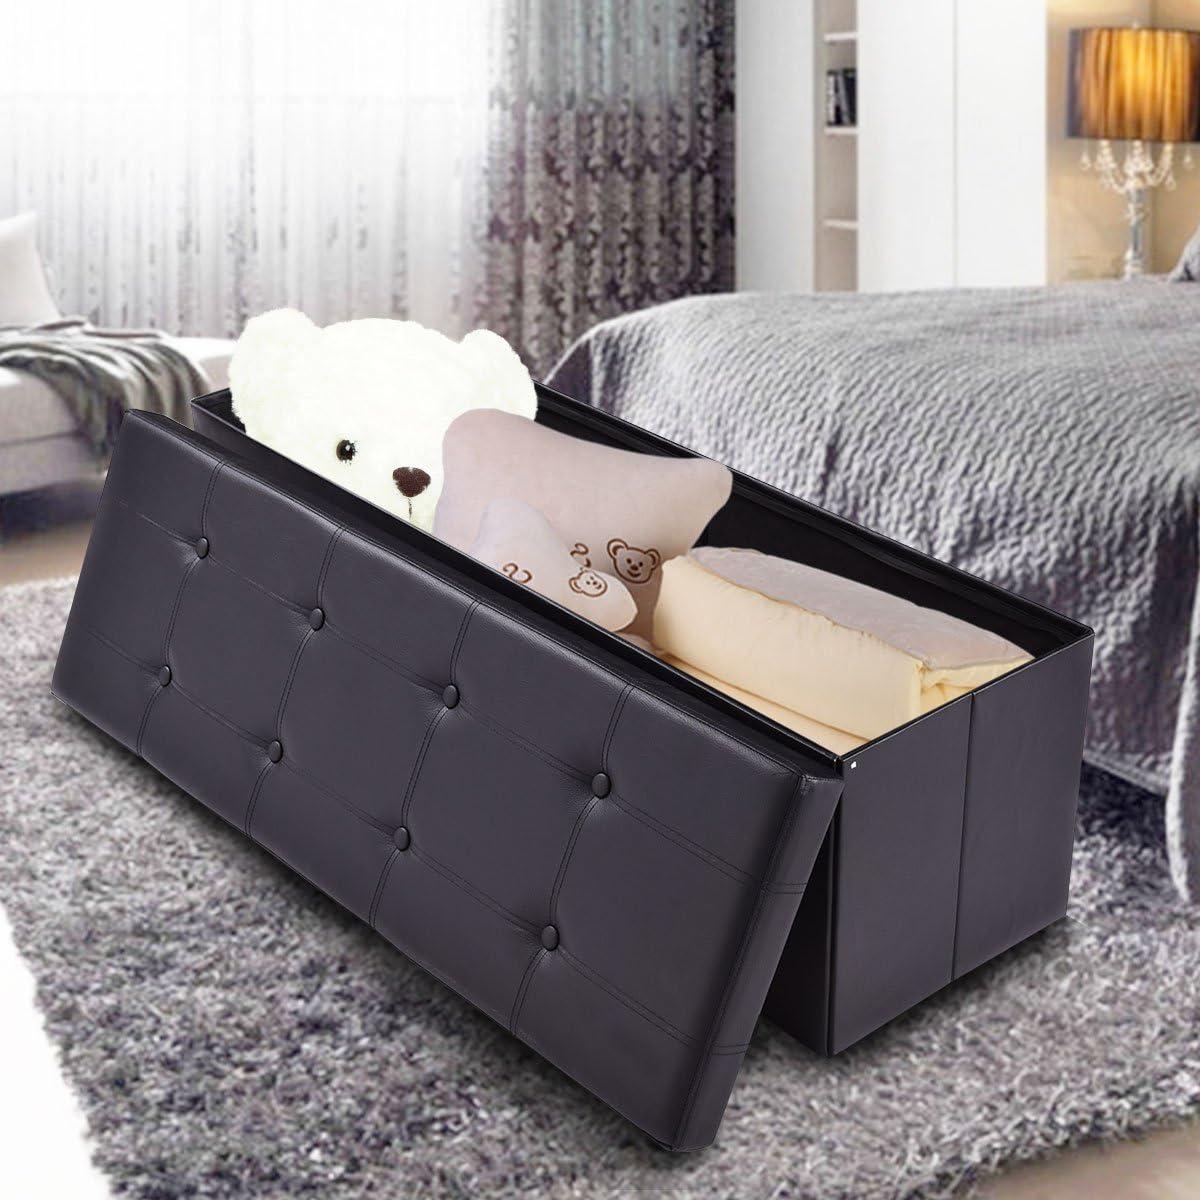 Casart Folding Storage Ottoman Faux Leather Large Bench Foot Rest Pouffe Box Stool Seat Folding Storage Box, Black Black